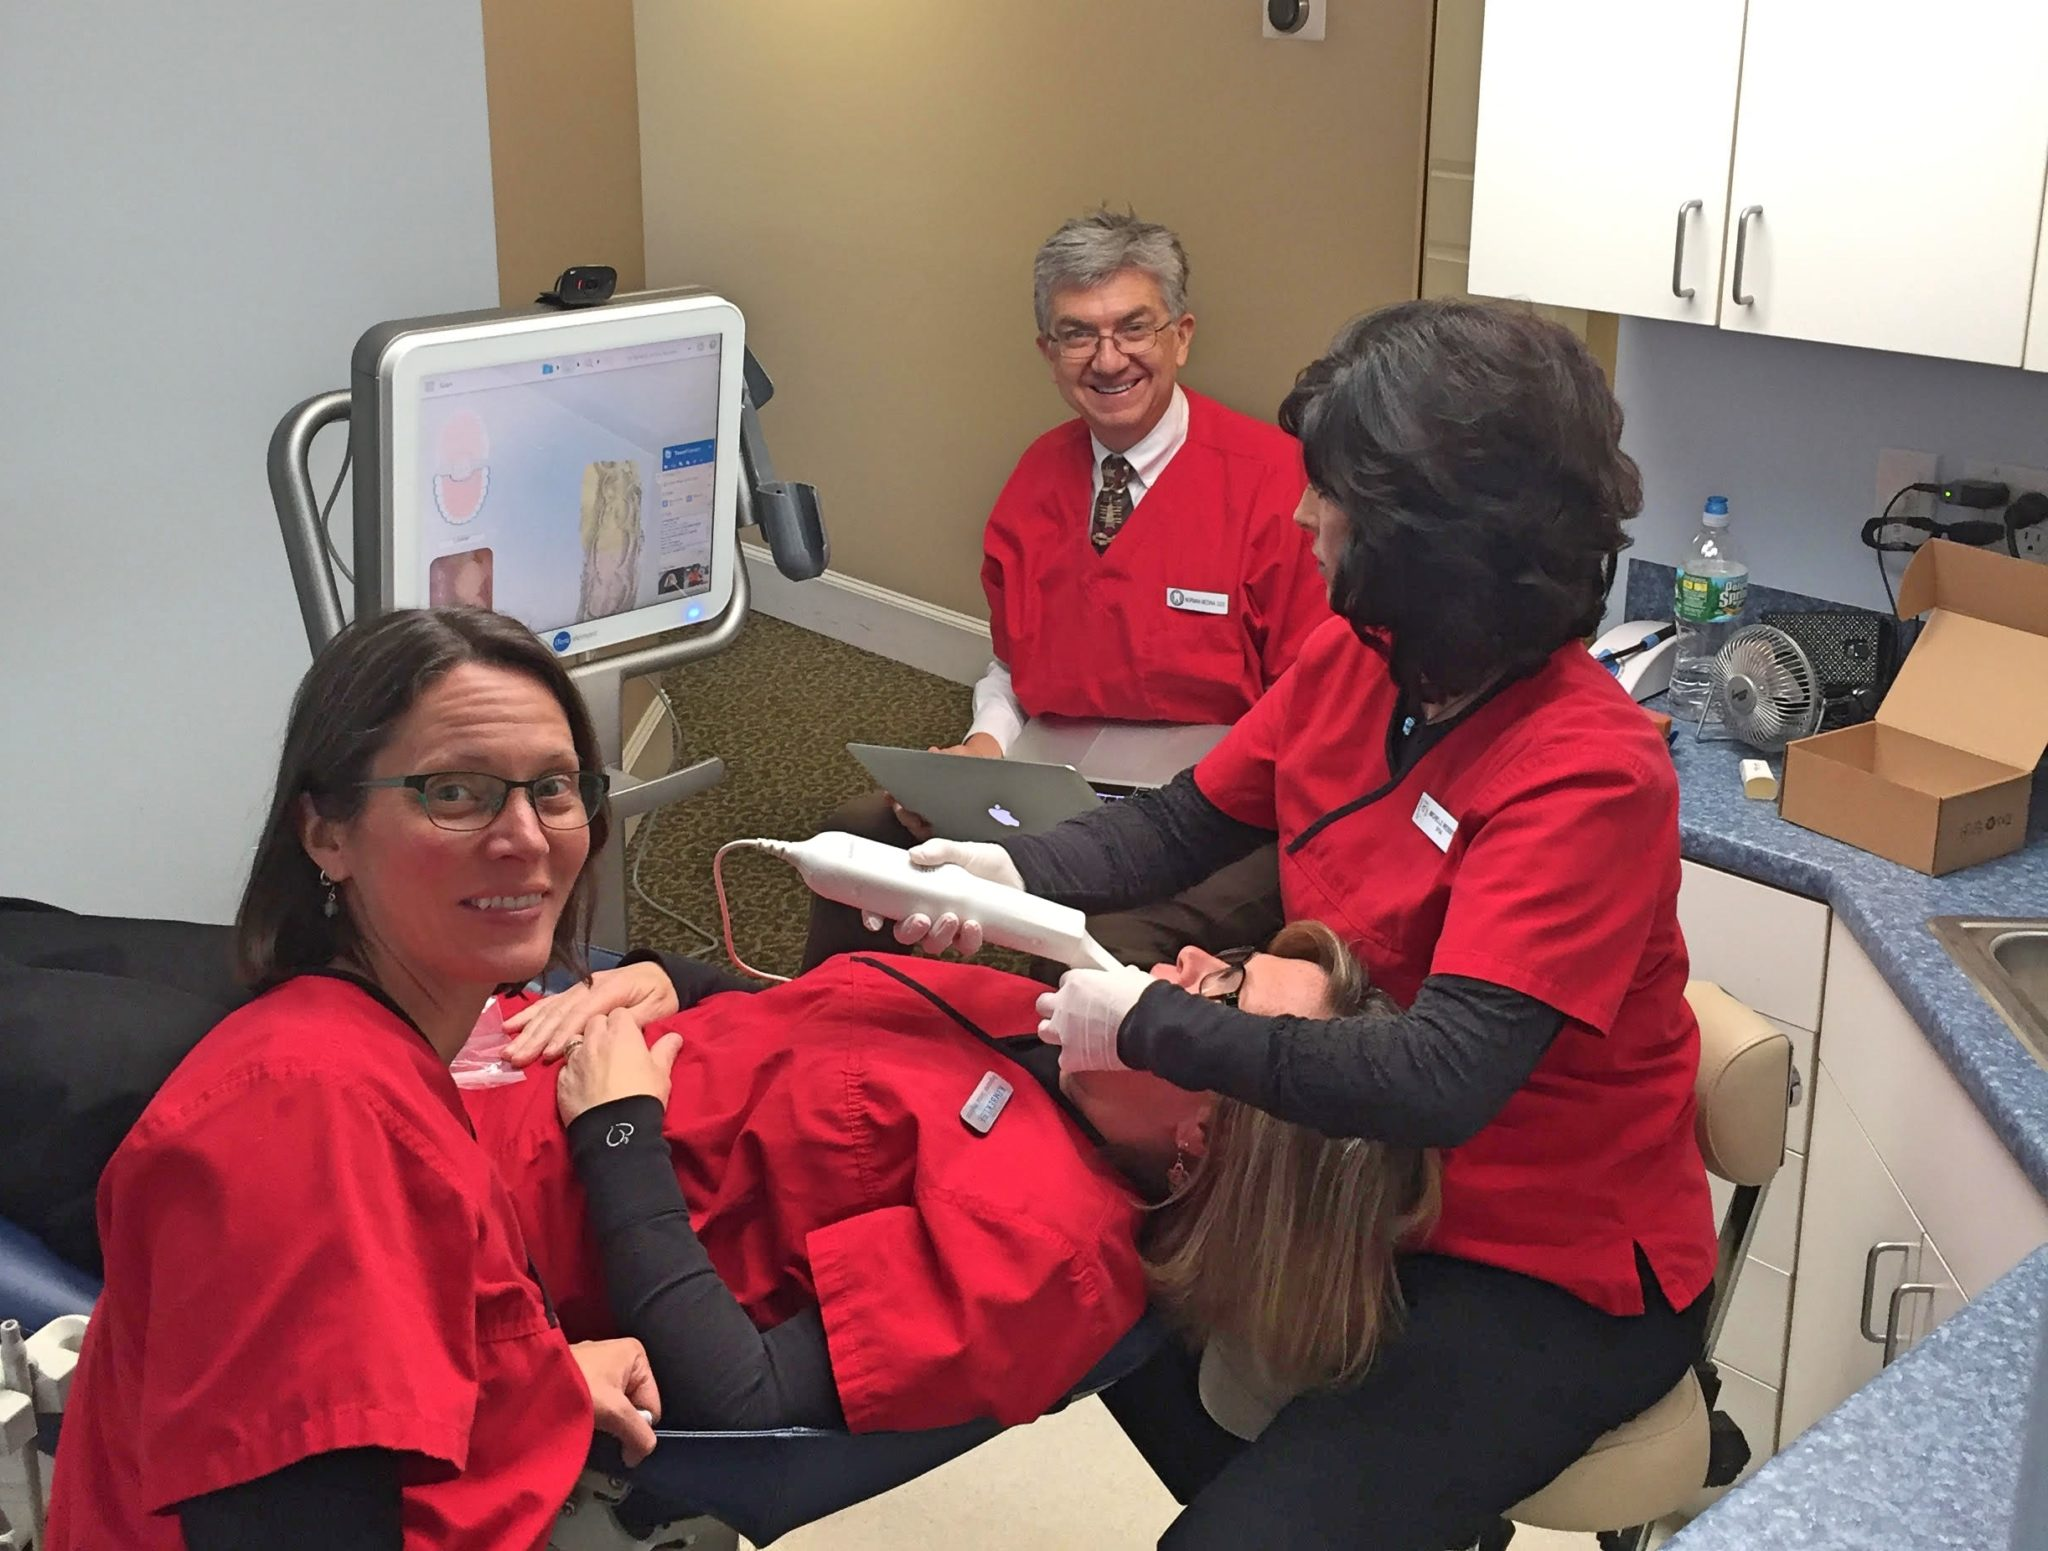 The Latest Dental Imaging Technology – Invisalign Itero Element